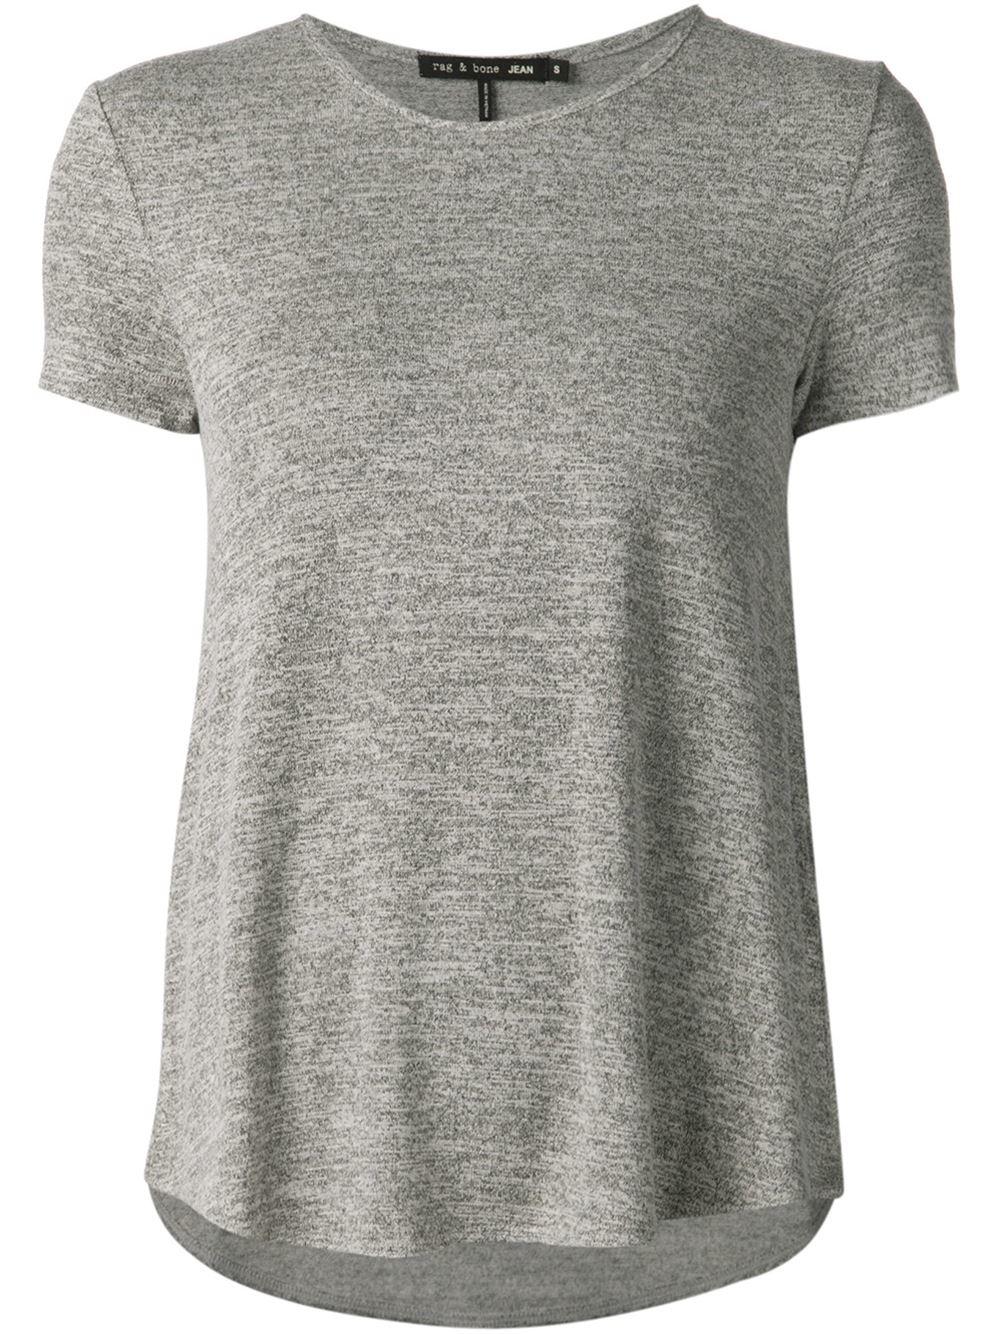 Rag bone vista jersey t shirt grey in gray lyst for Rag and bone t shirts